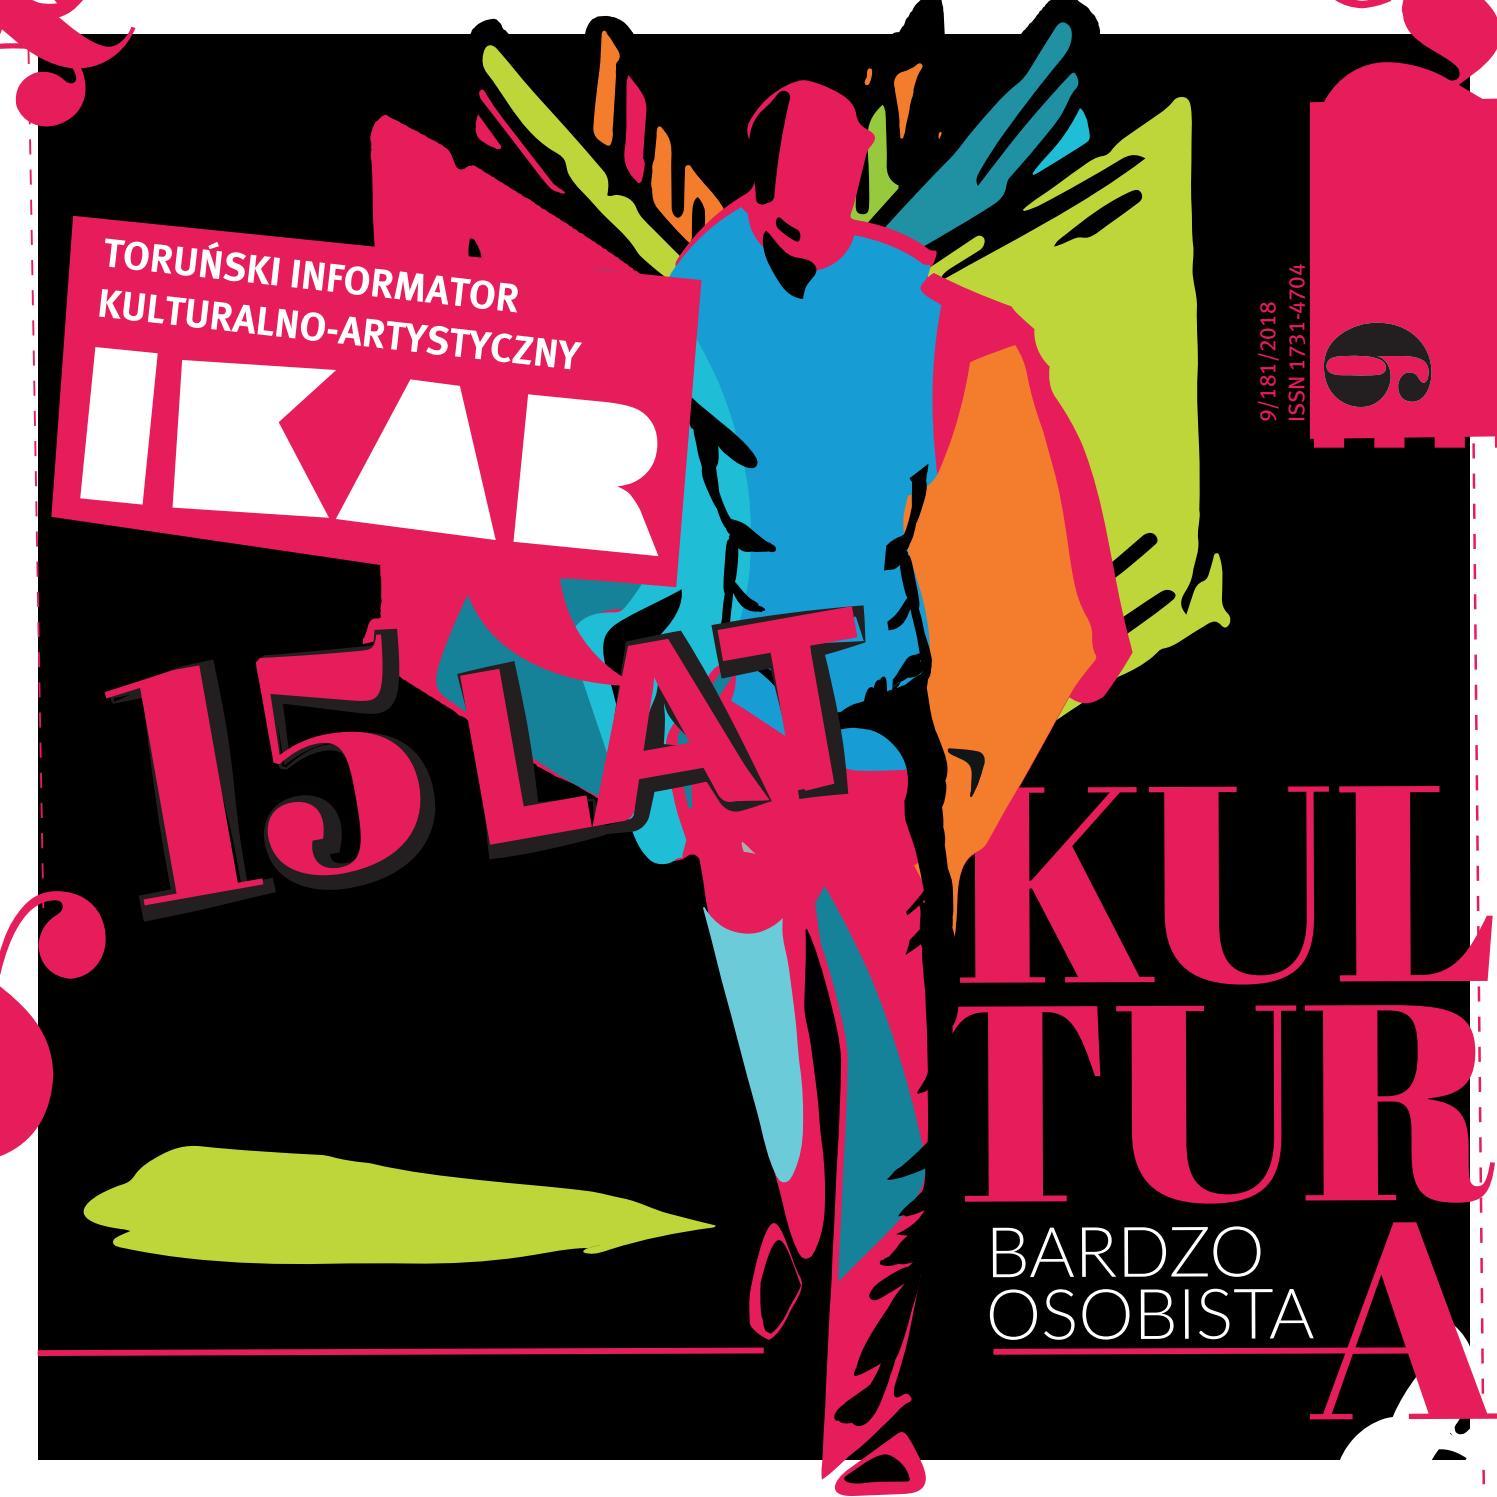 Ikar 91812018 By Toruński Informator Kulturalno